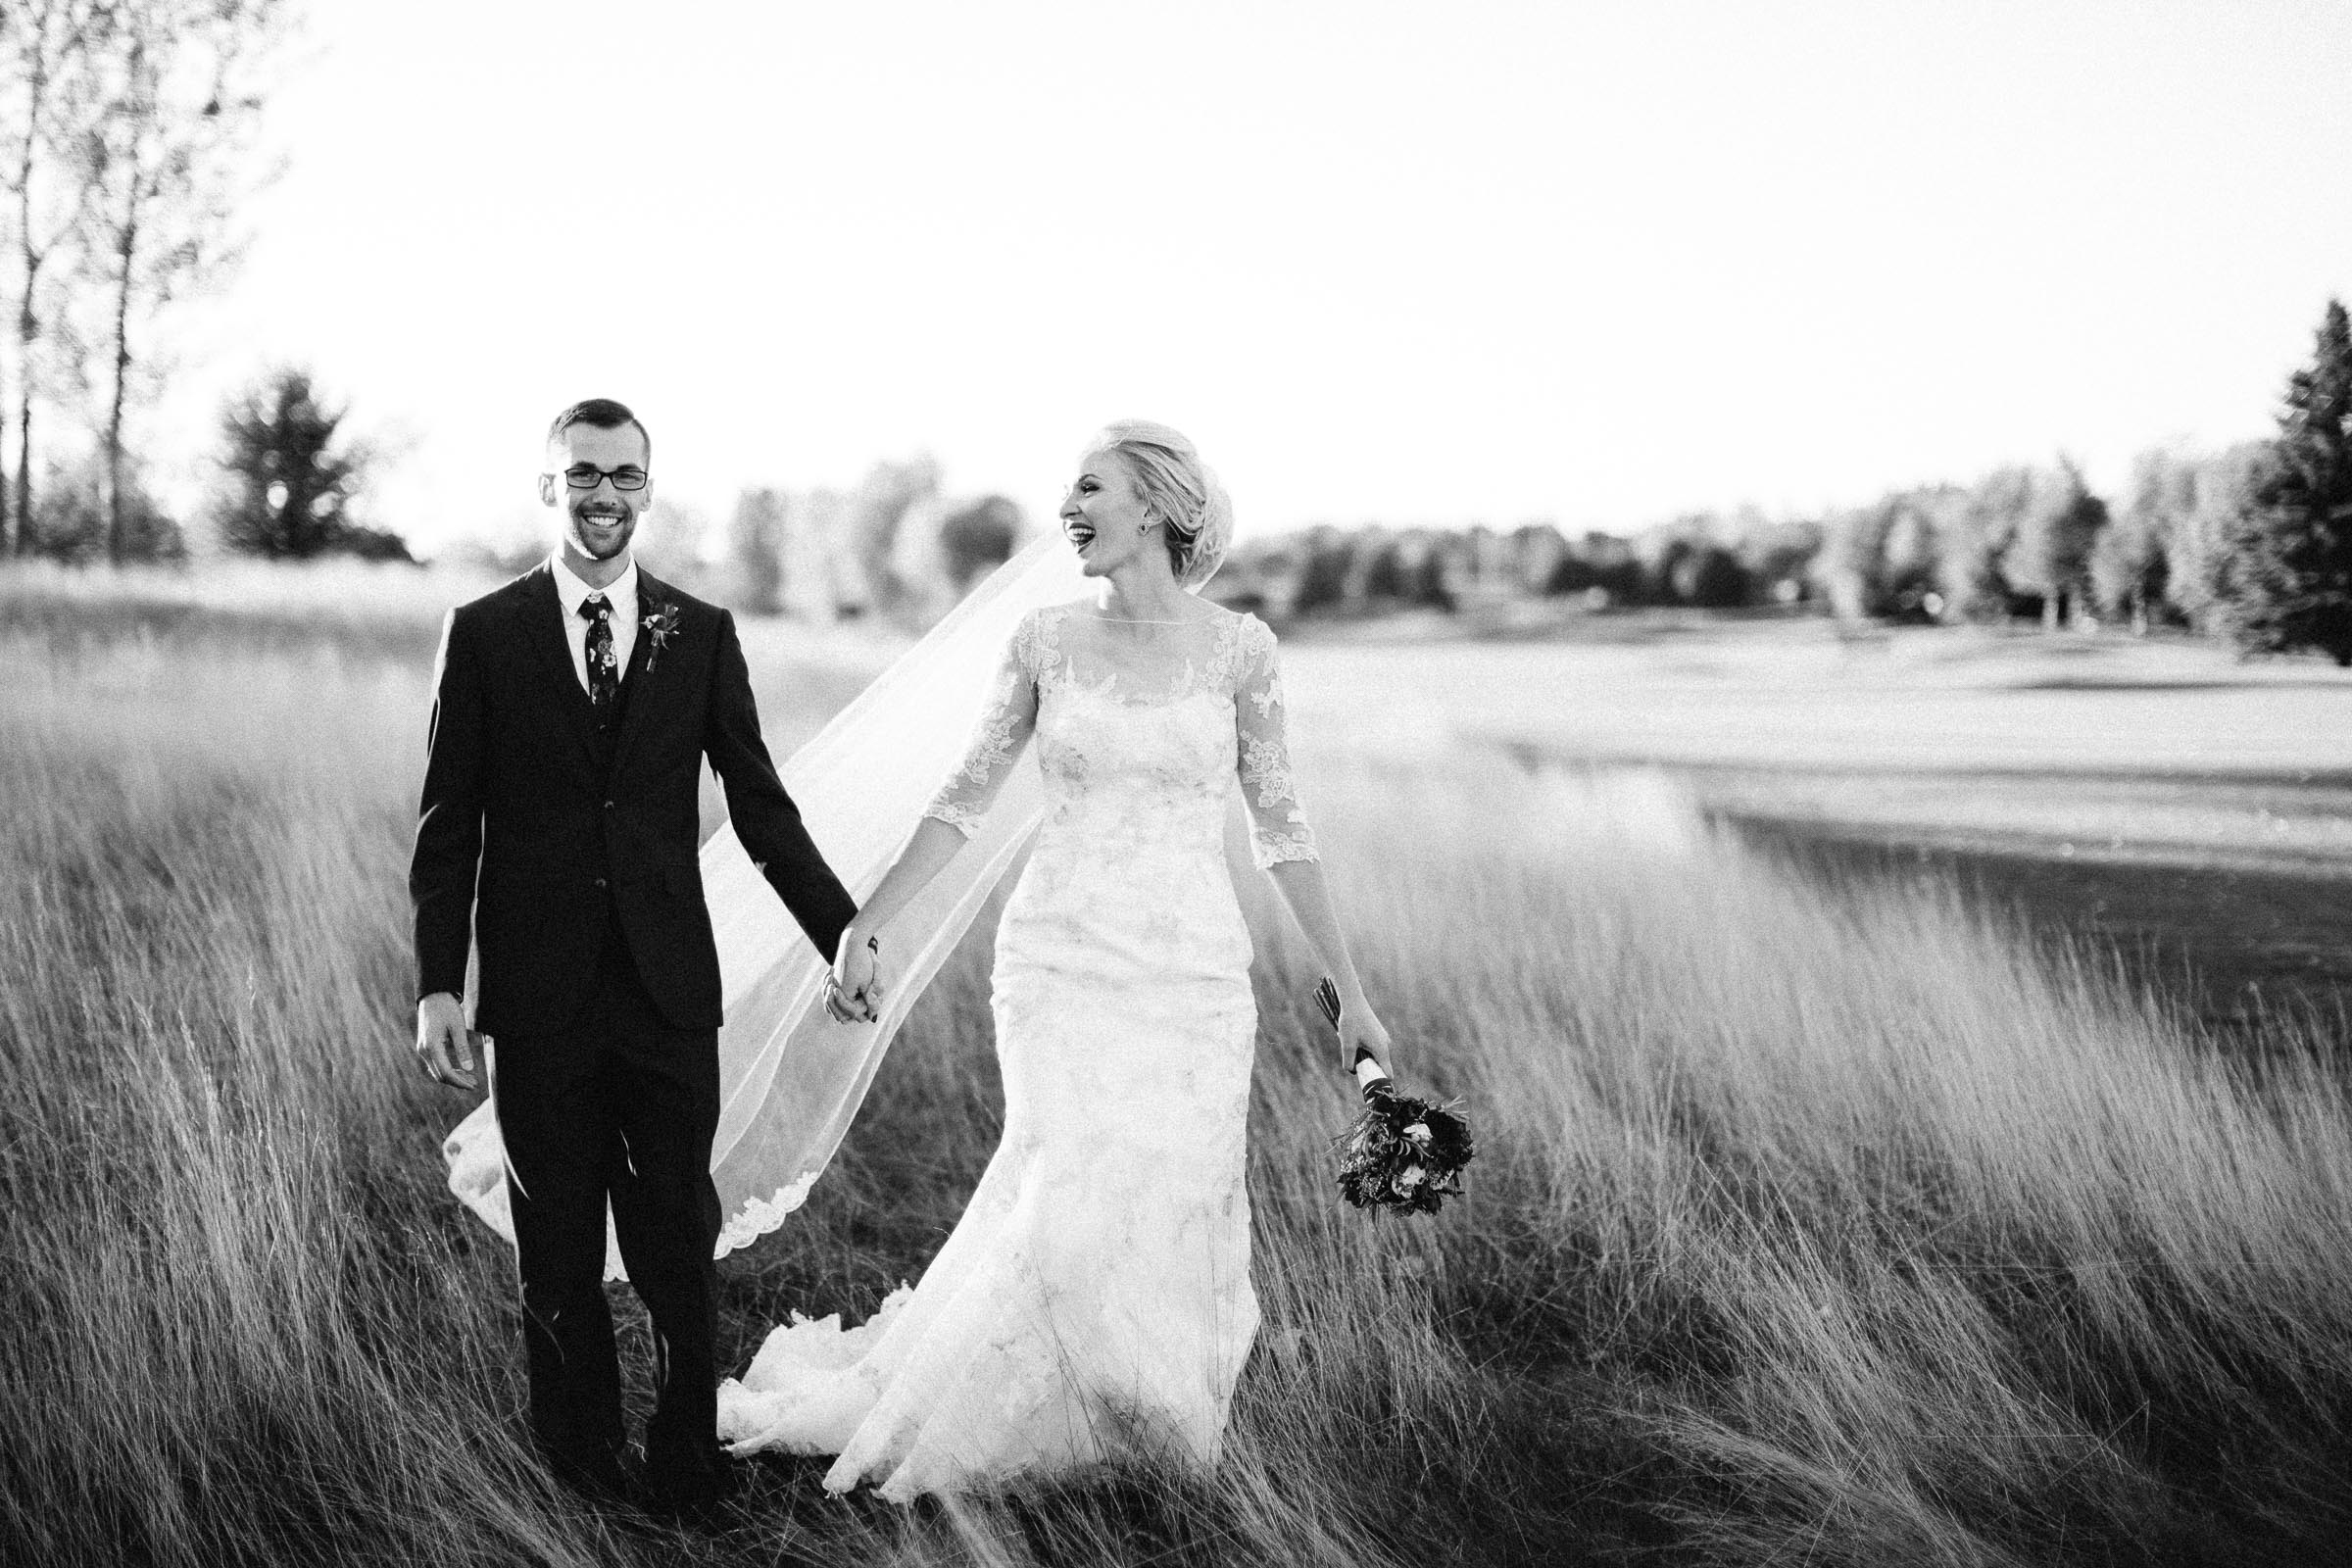 Jenna&Austin_SiouxFalls_Wedding_Photographer_091.jpg